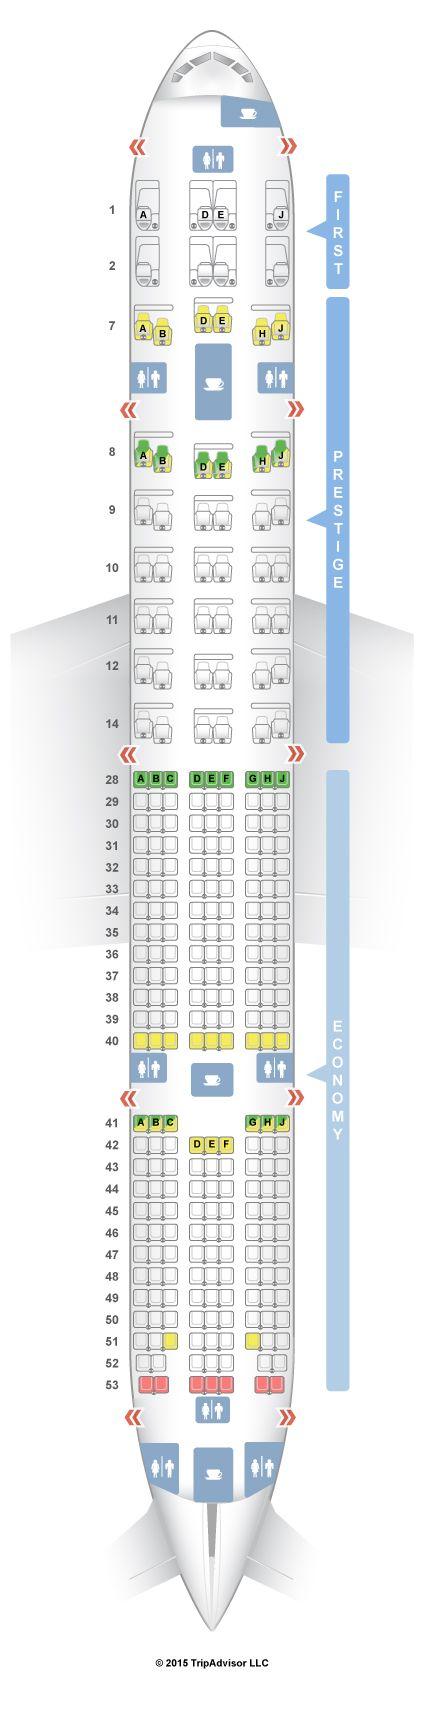 SeatGuru Seat Map Korean Air Boeing 777-300ER (77W) V1